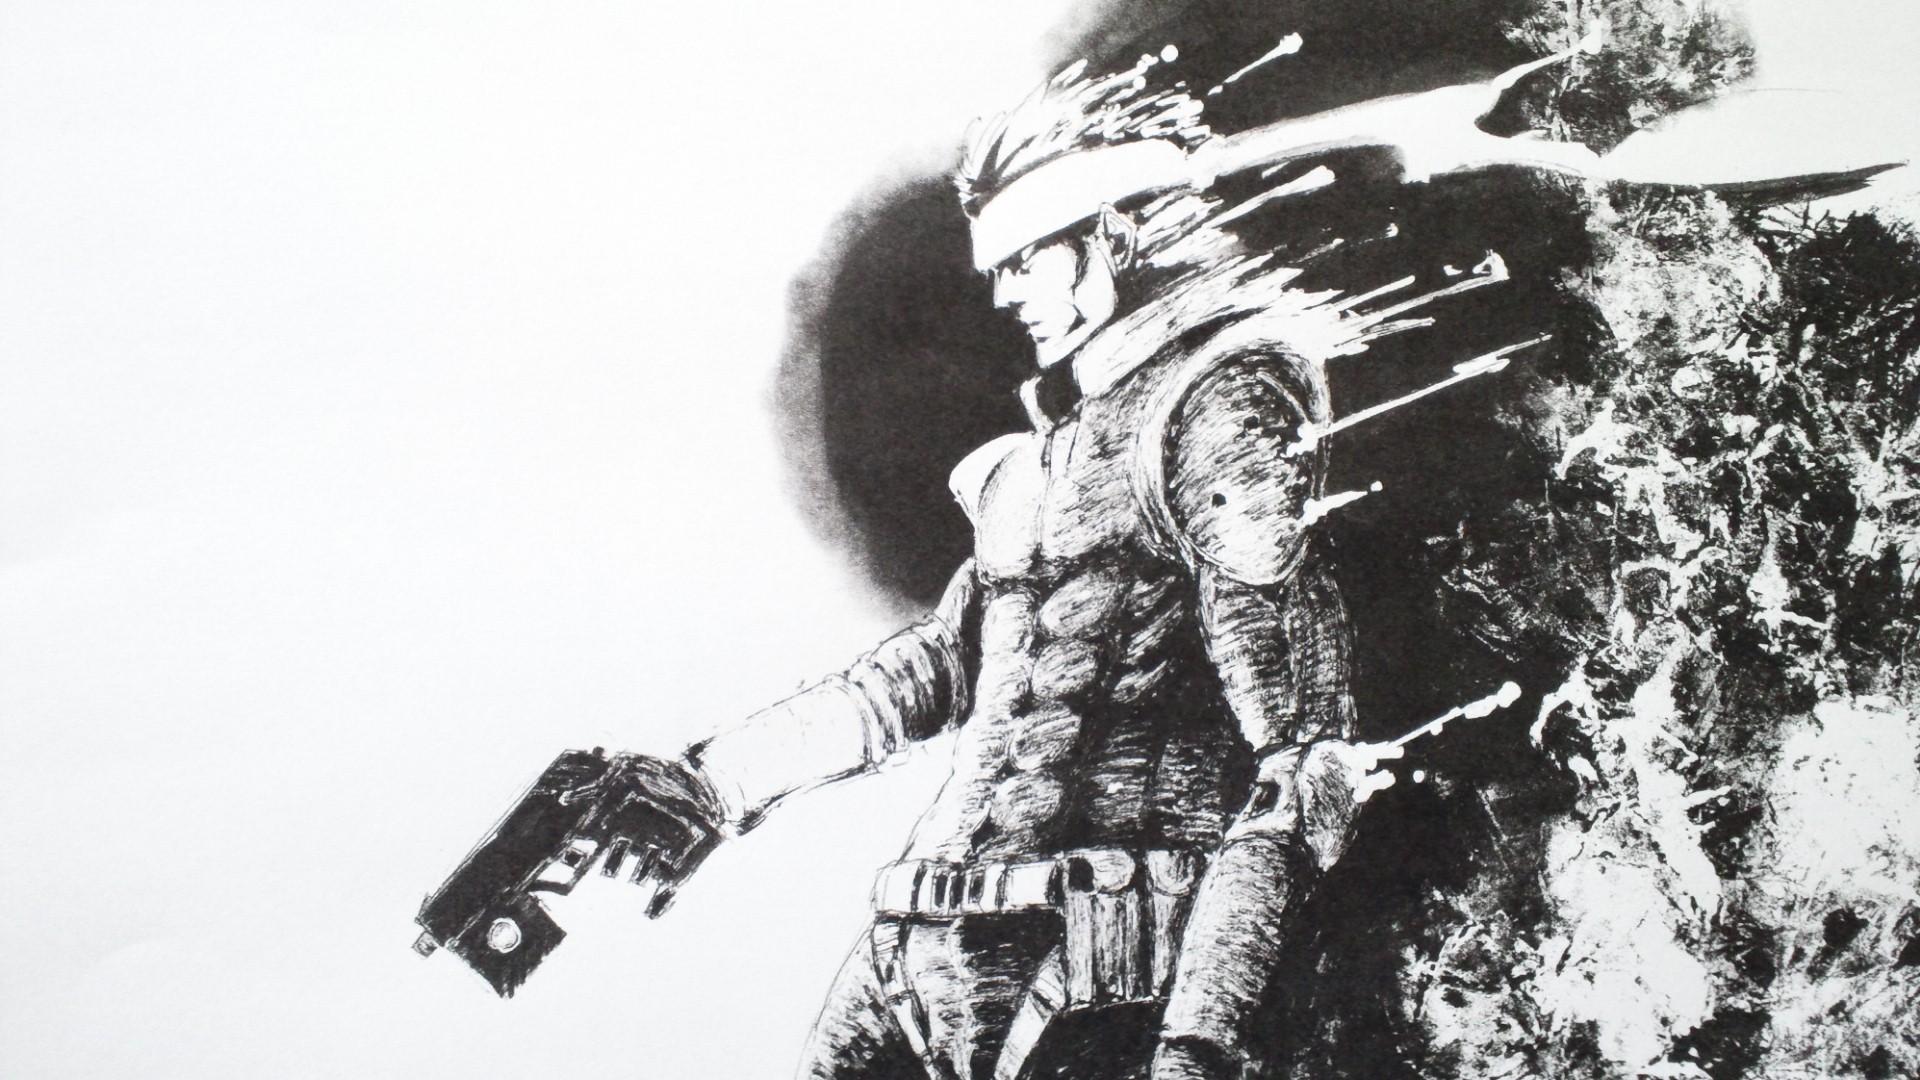 metal_gear_solid_solid_snake_hd_wallpaper